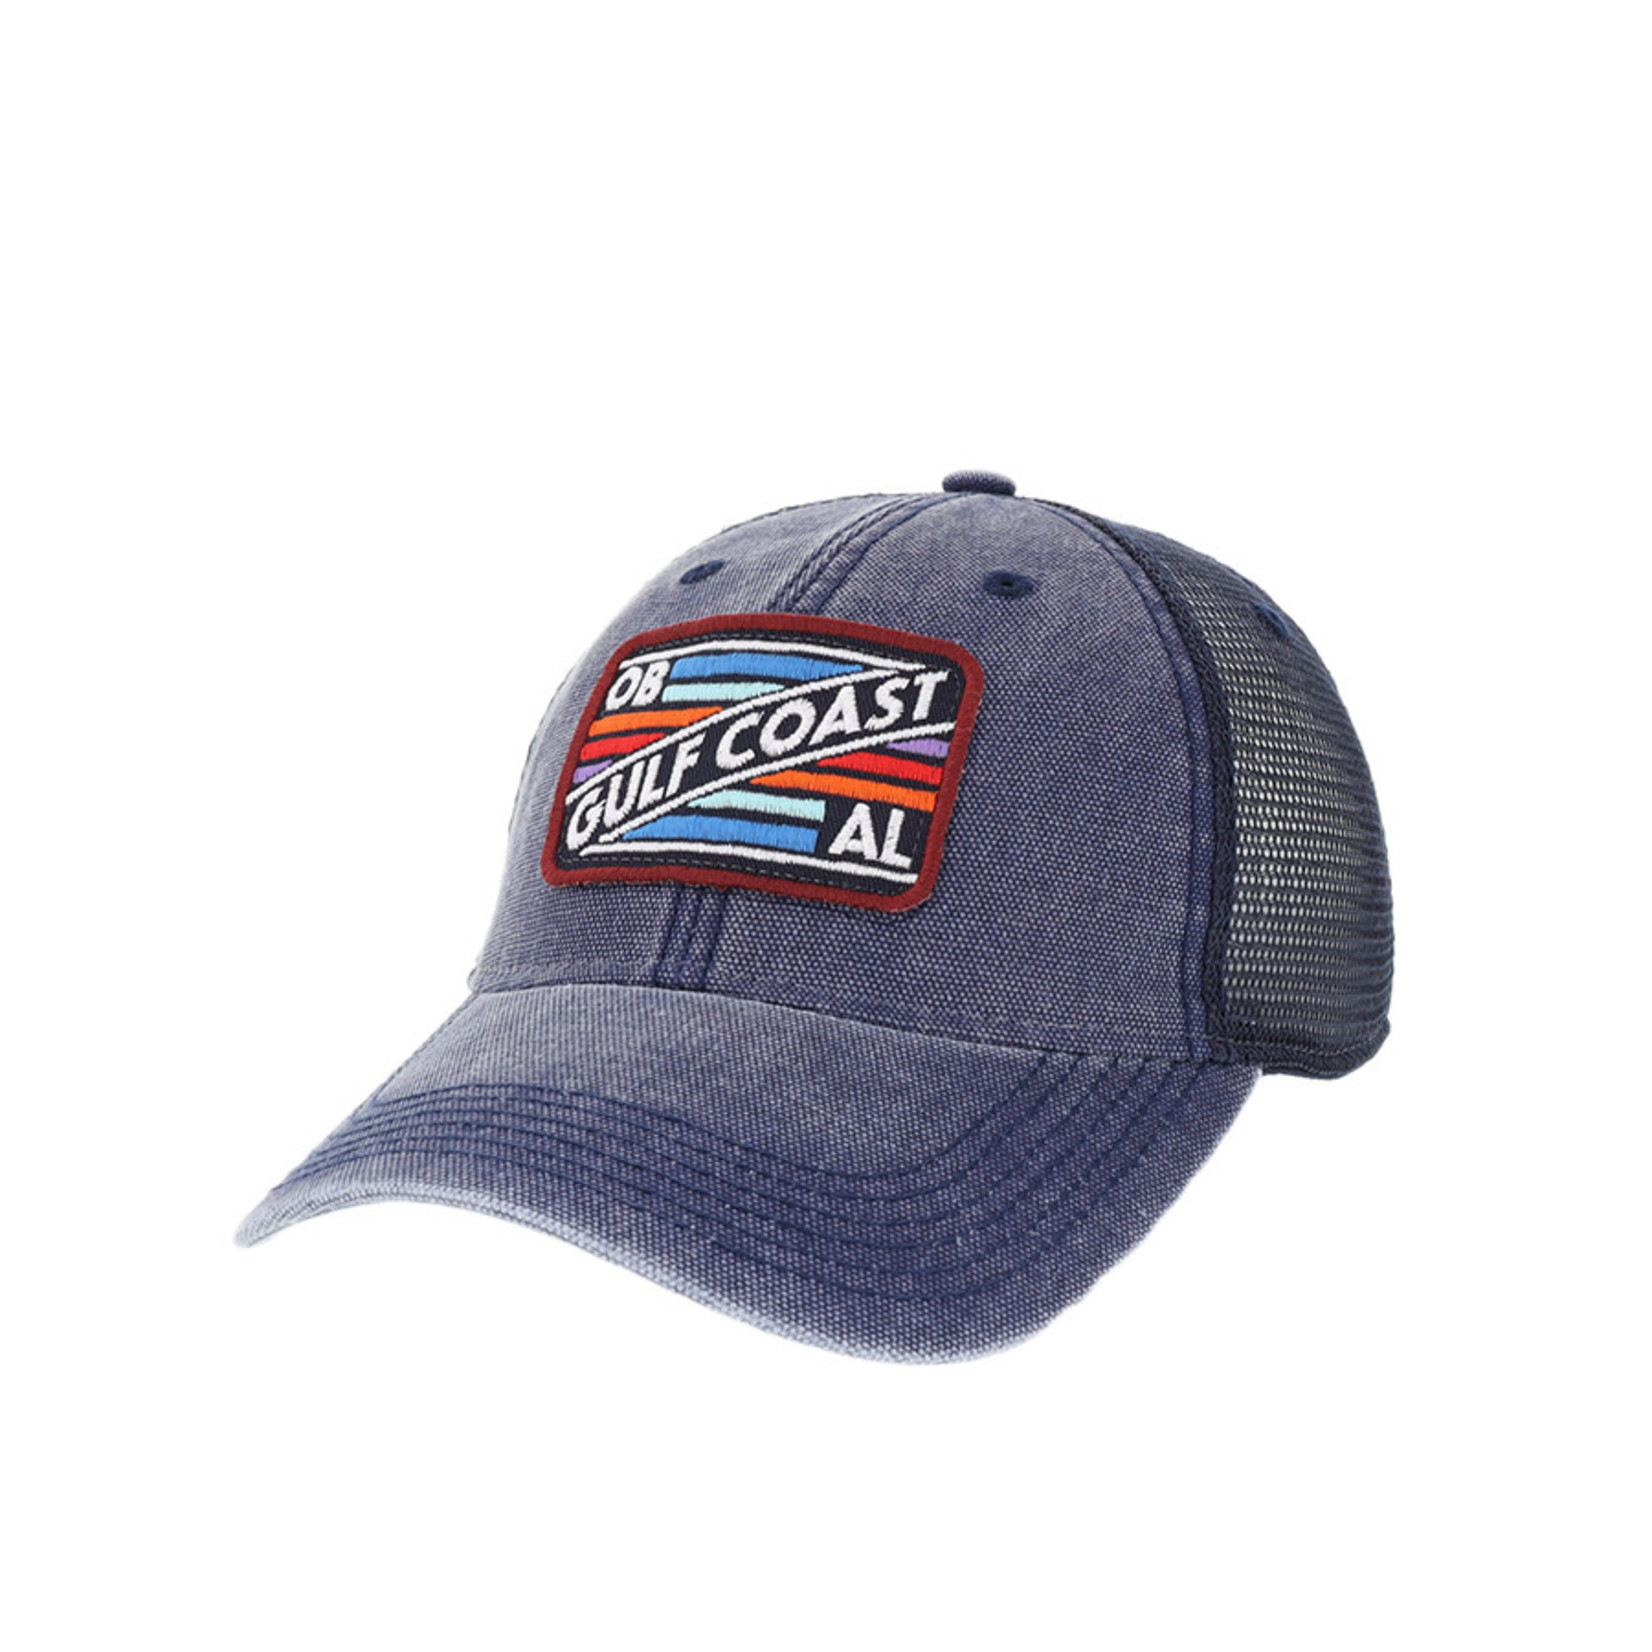 L2 Brands Gulf Coast Dashboard Trucker